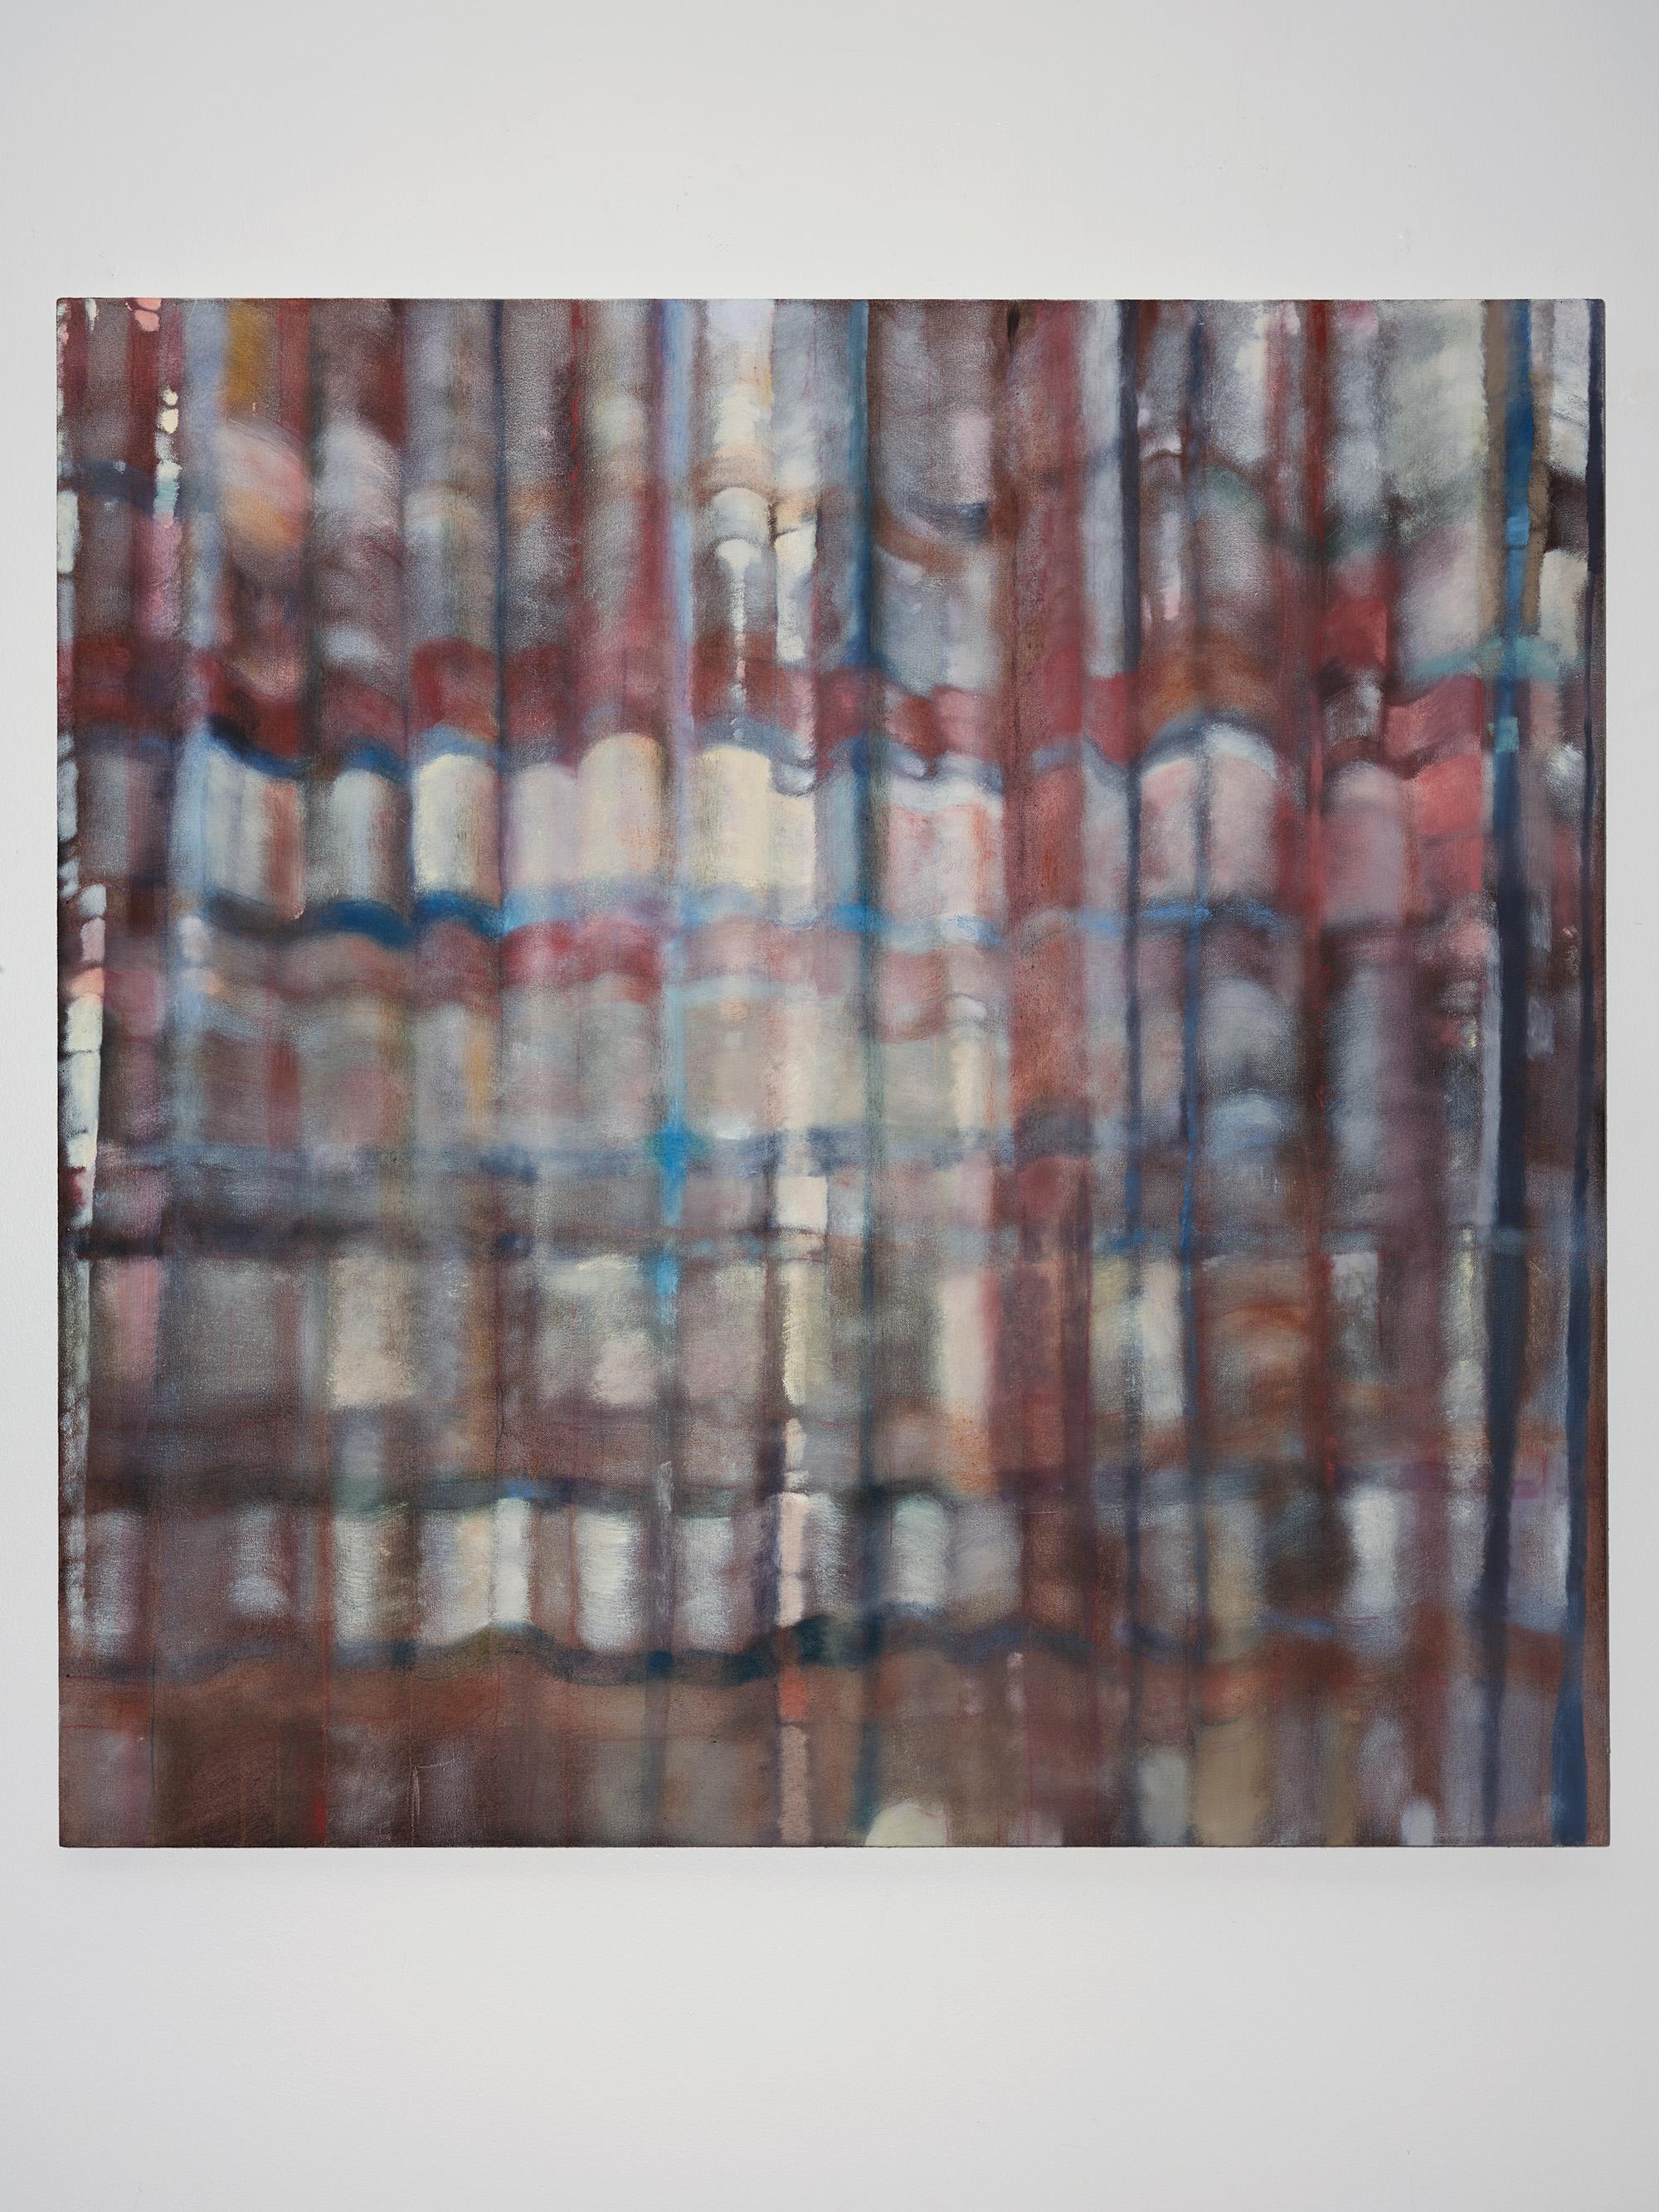 Kundalinimas , 2018, 47 x 47 inches, Oil on canvas